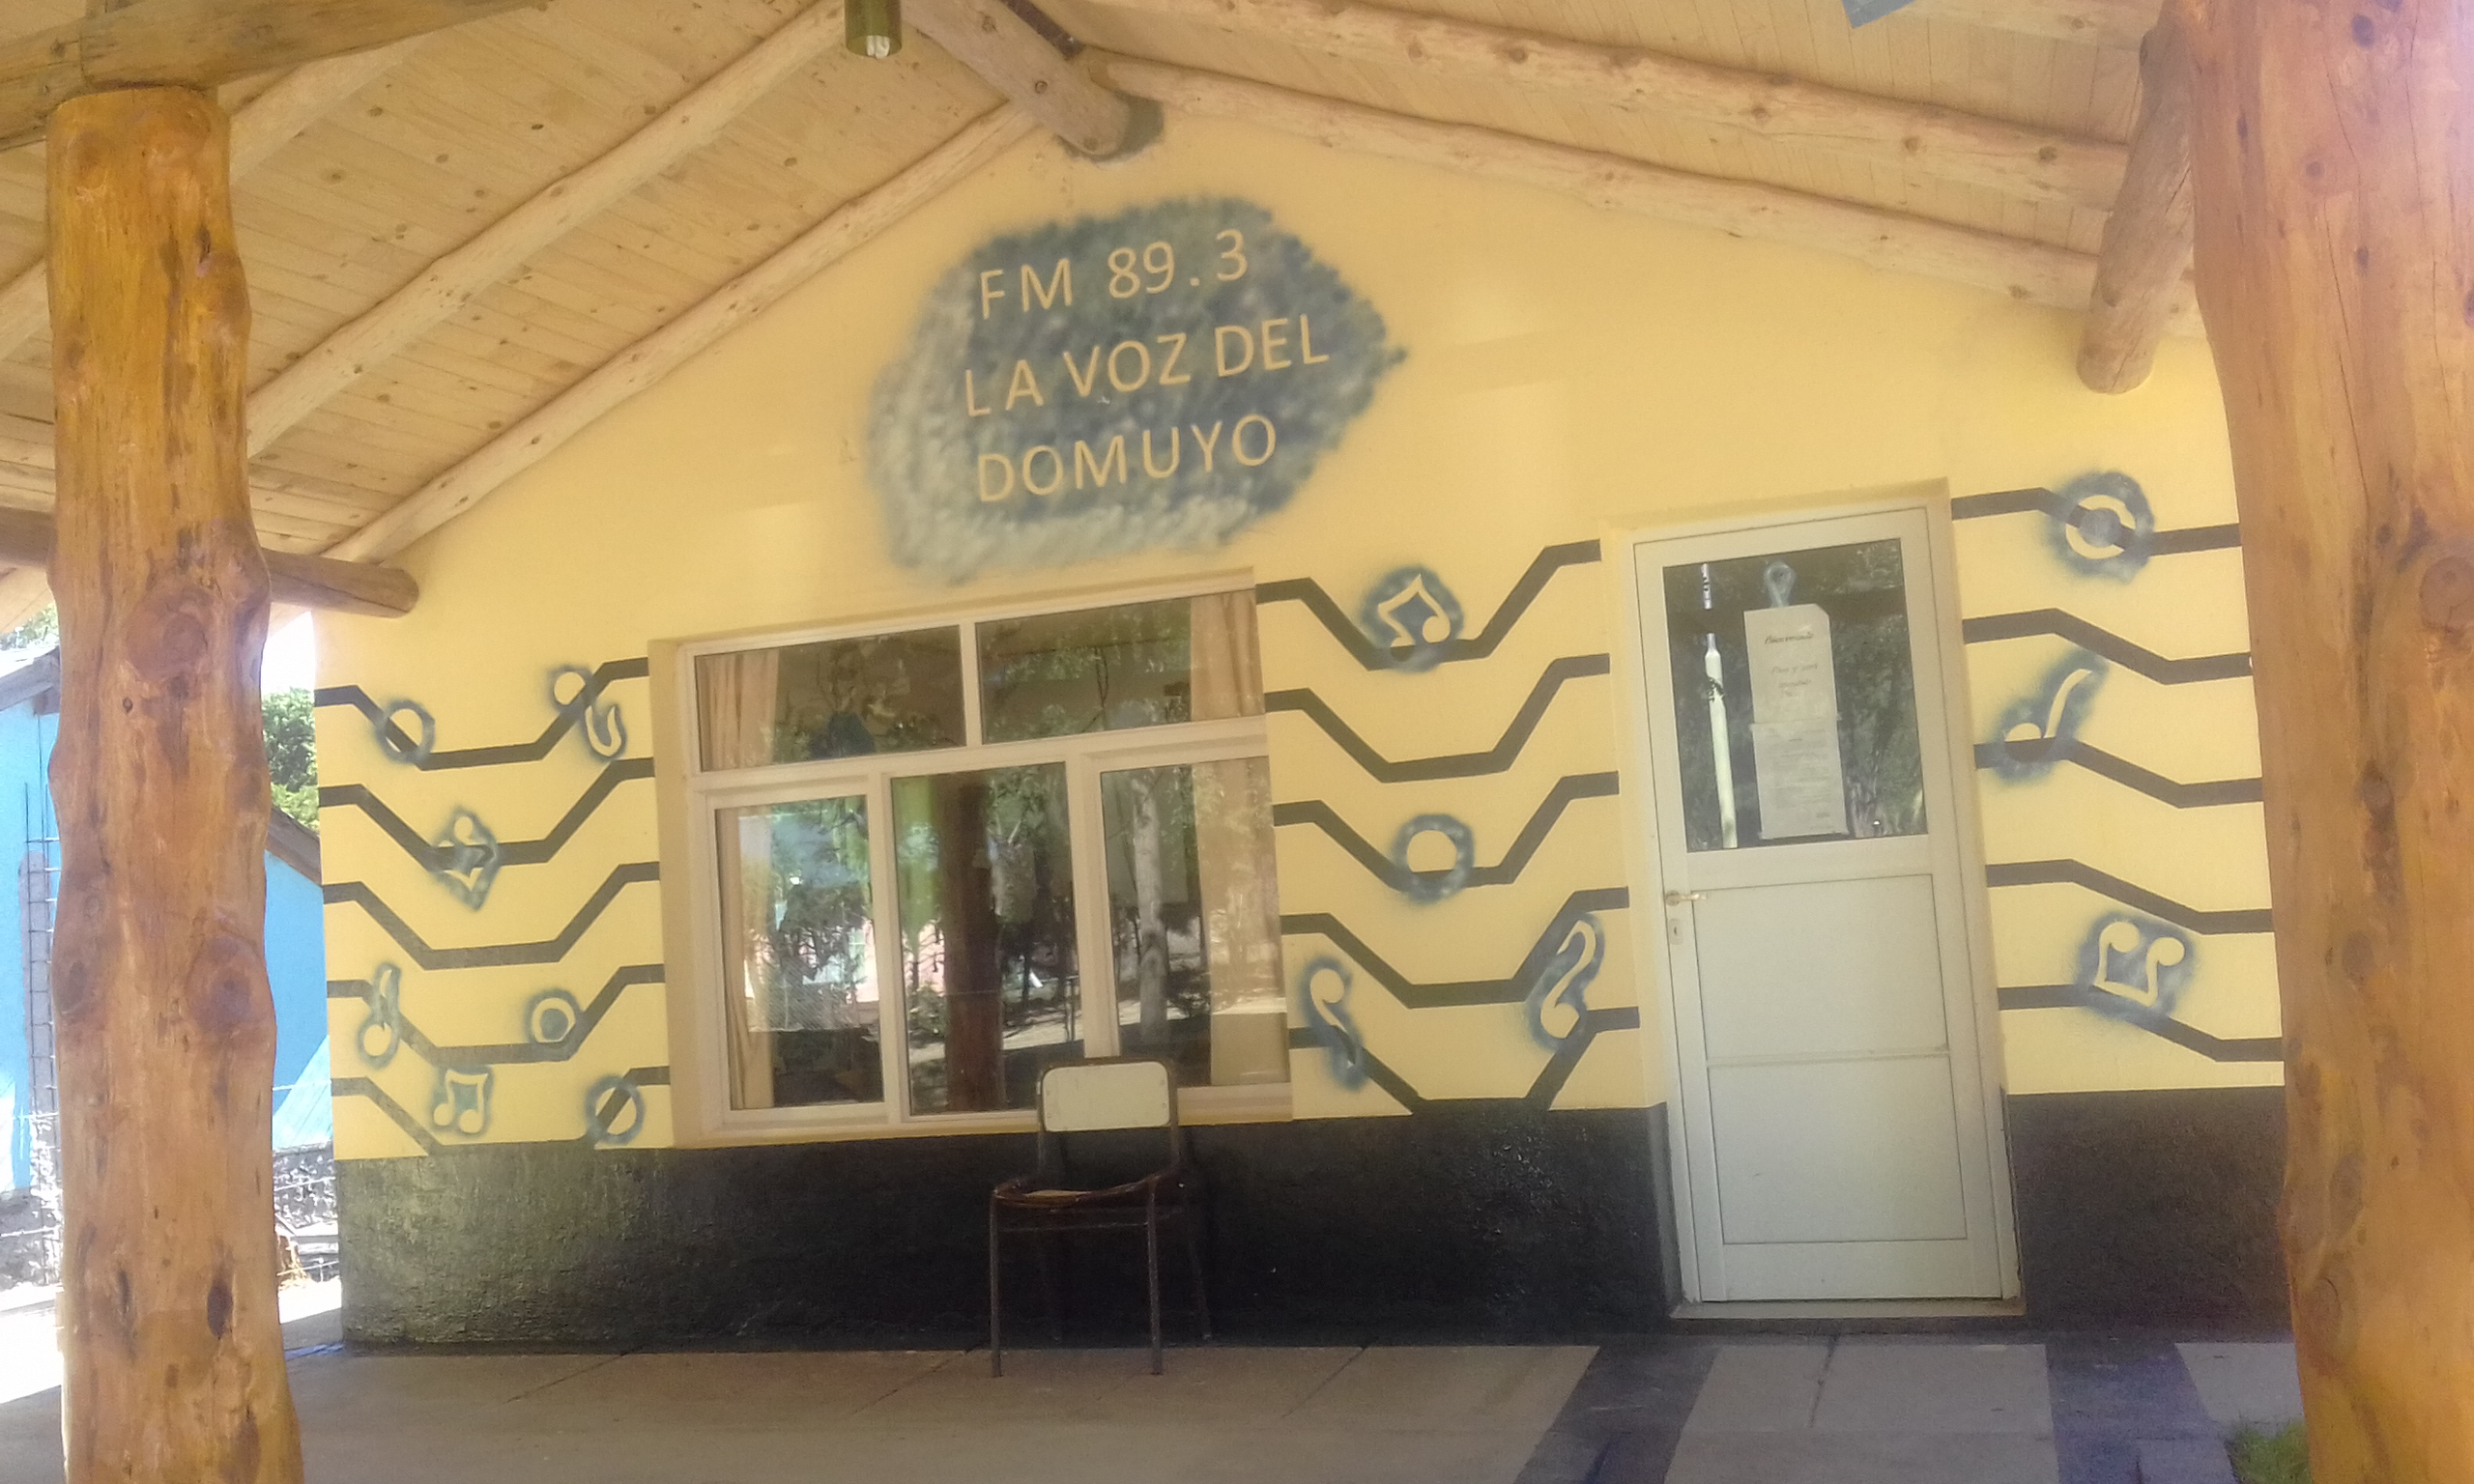 FM 89.3 - LA VOZ DEL DOMUYO